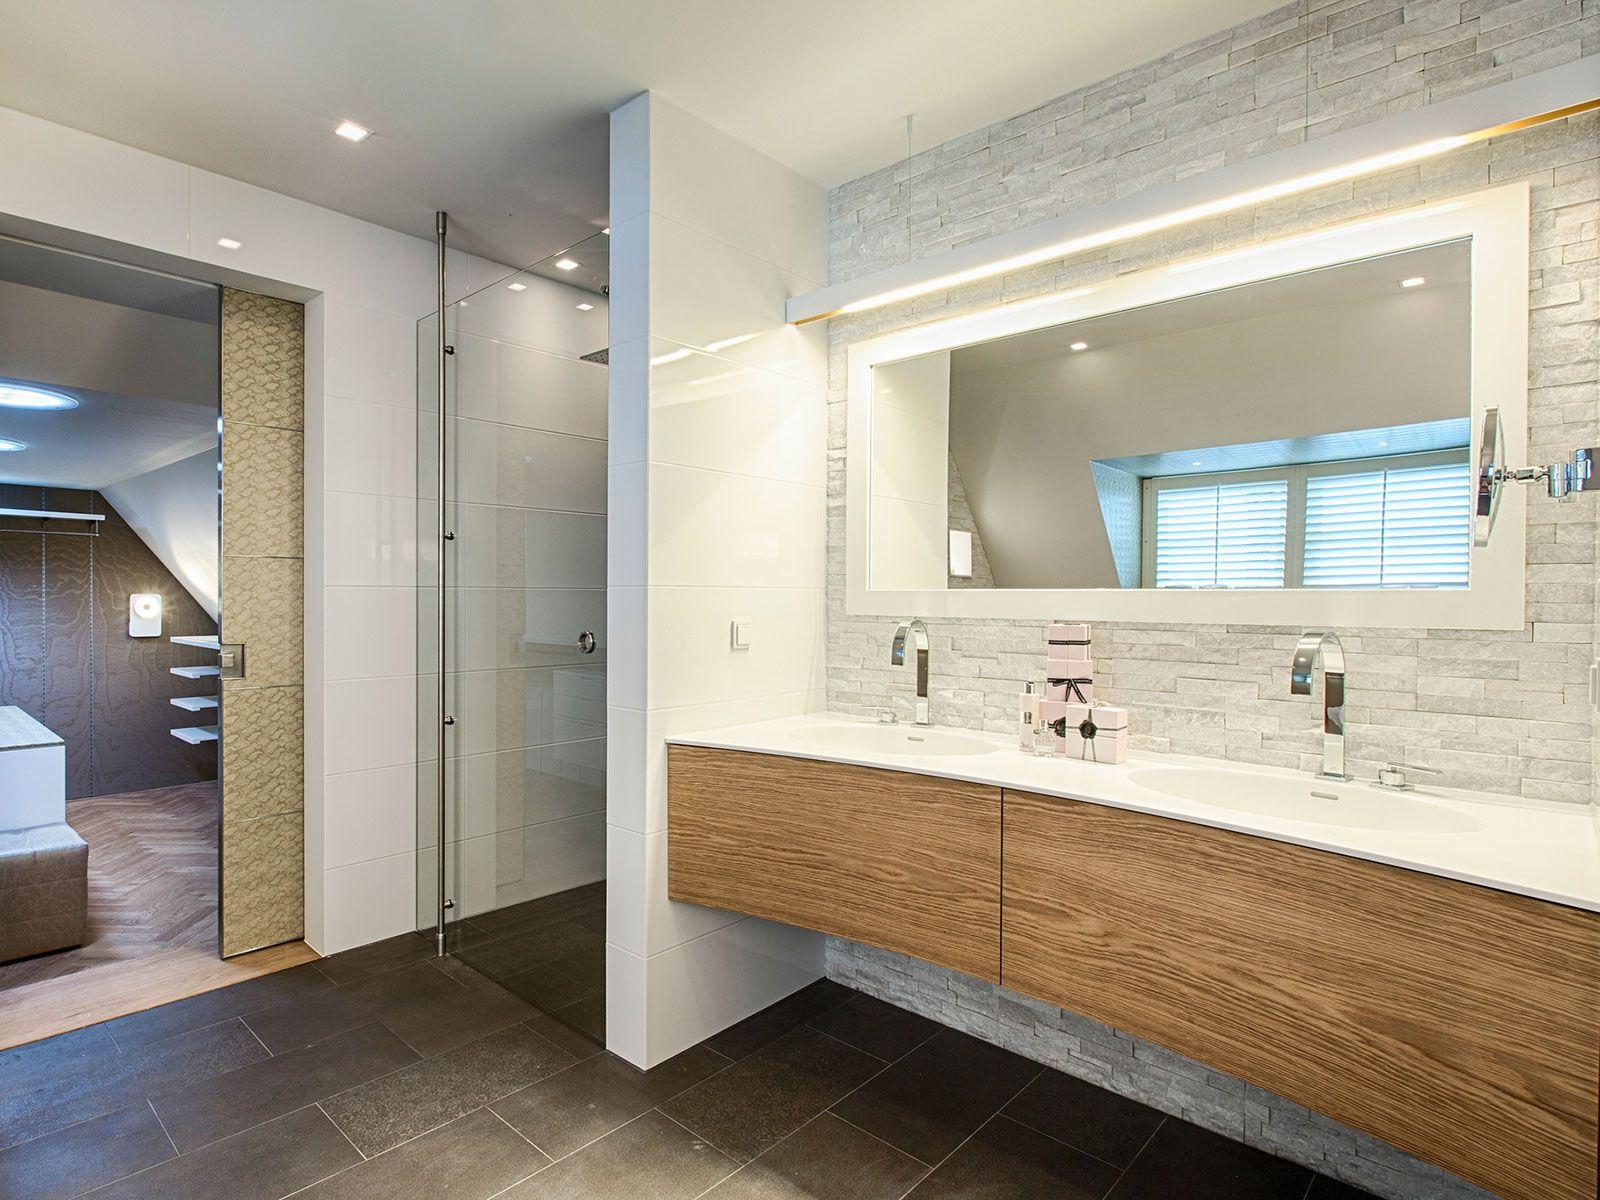 Ip Waarde Badkamer : Badkamerverlichting enkele tips